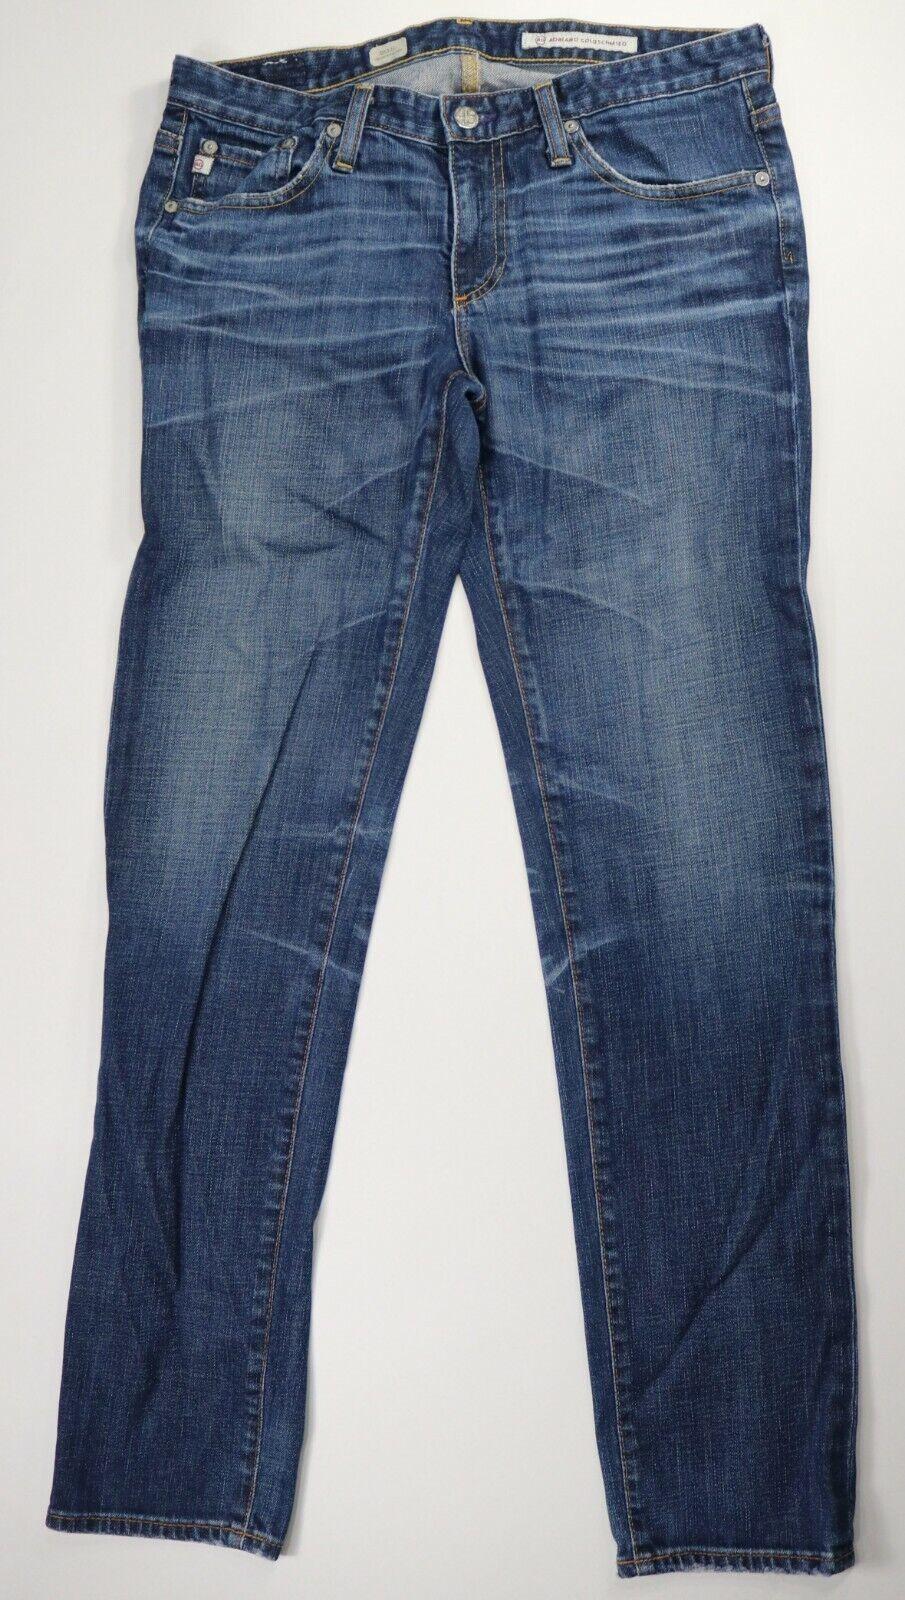 AG Adriano goldschmied bluee Medium Wash Cigarette Leg Jeans Inseam 30